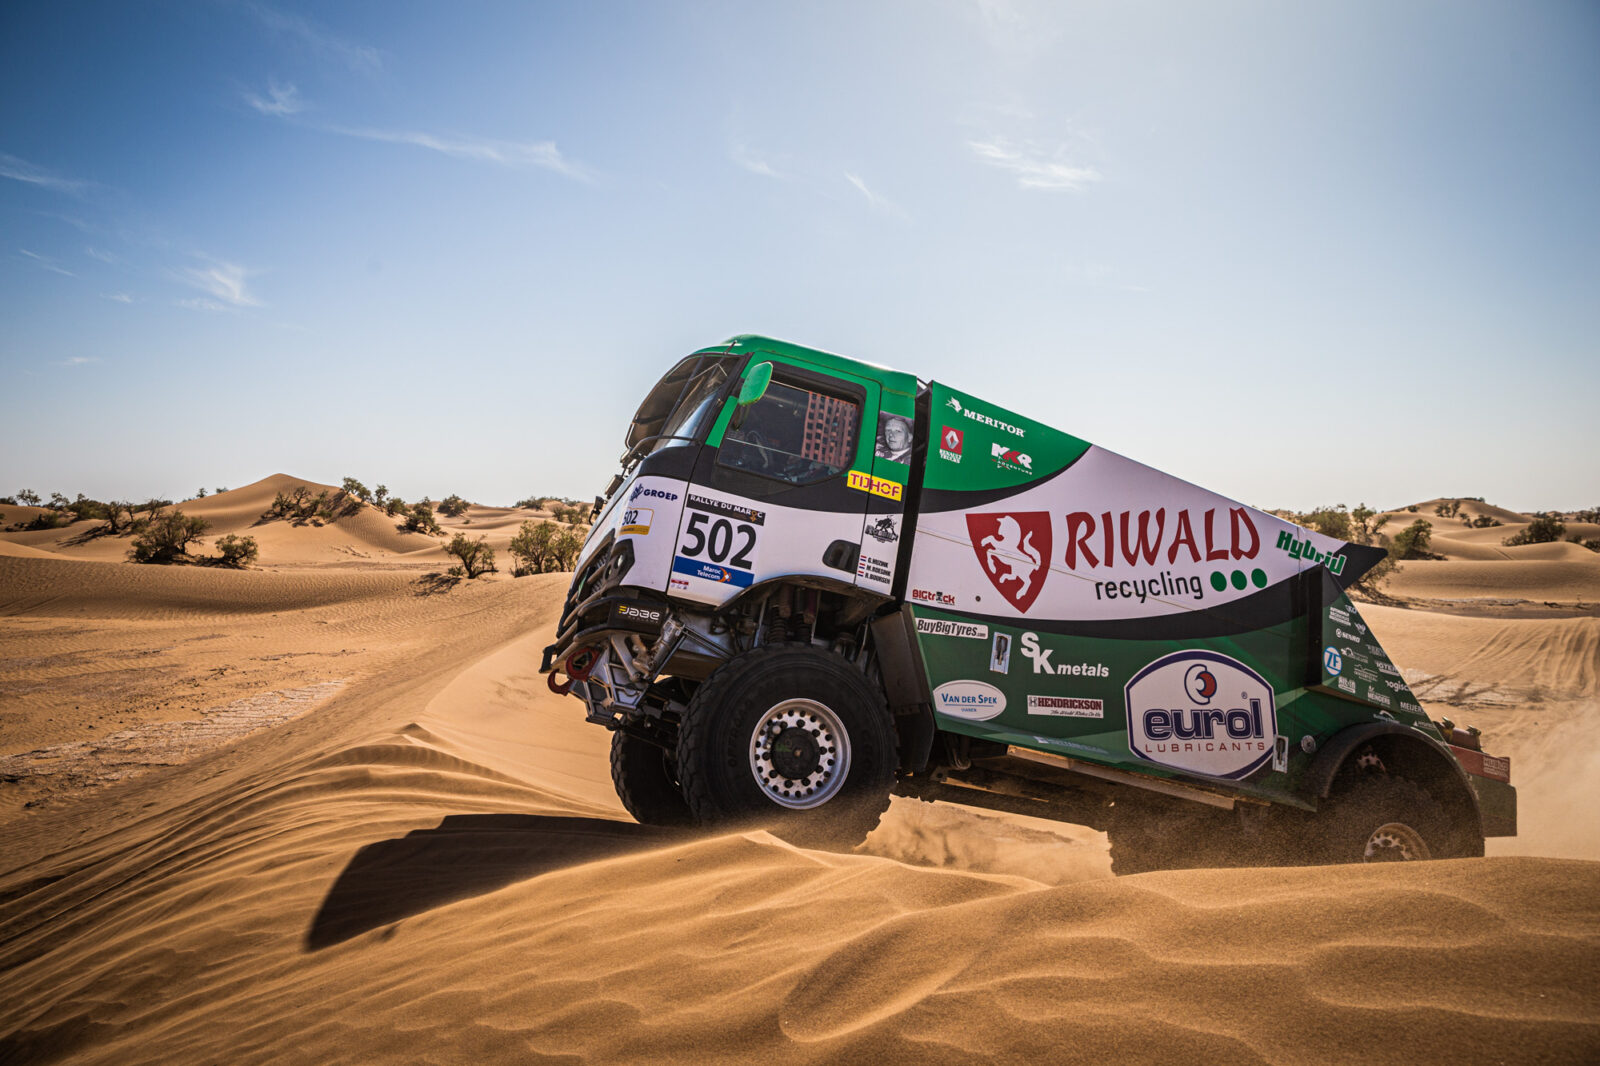 Rallye du Maroc stage 1